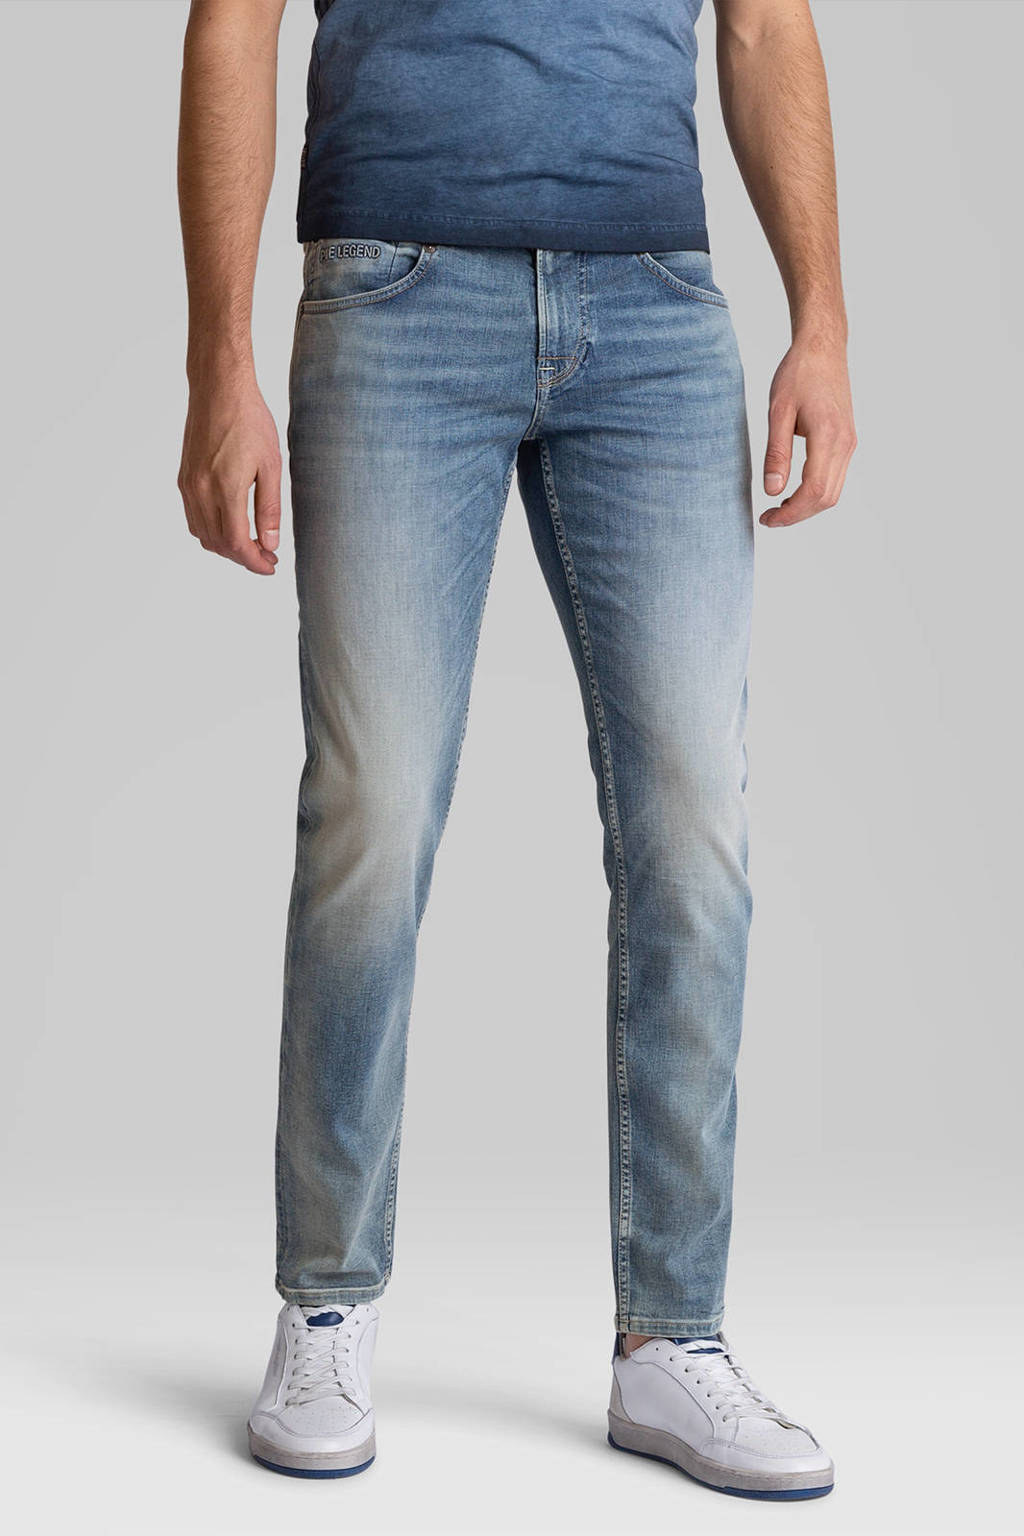 PME Legend slim fit jeans Freighter blauw, Blauw